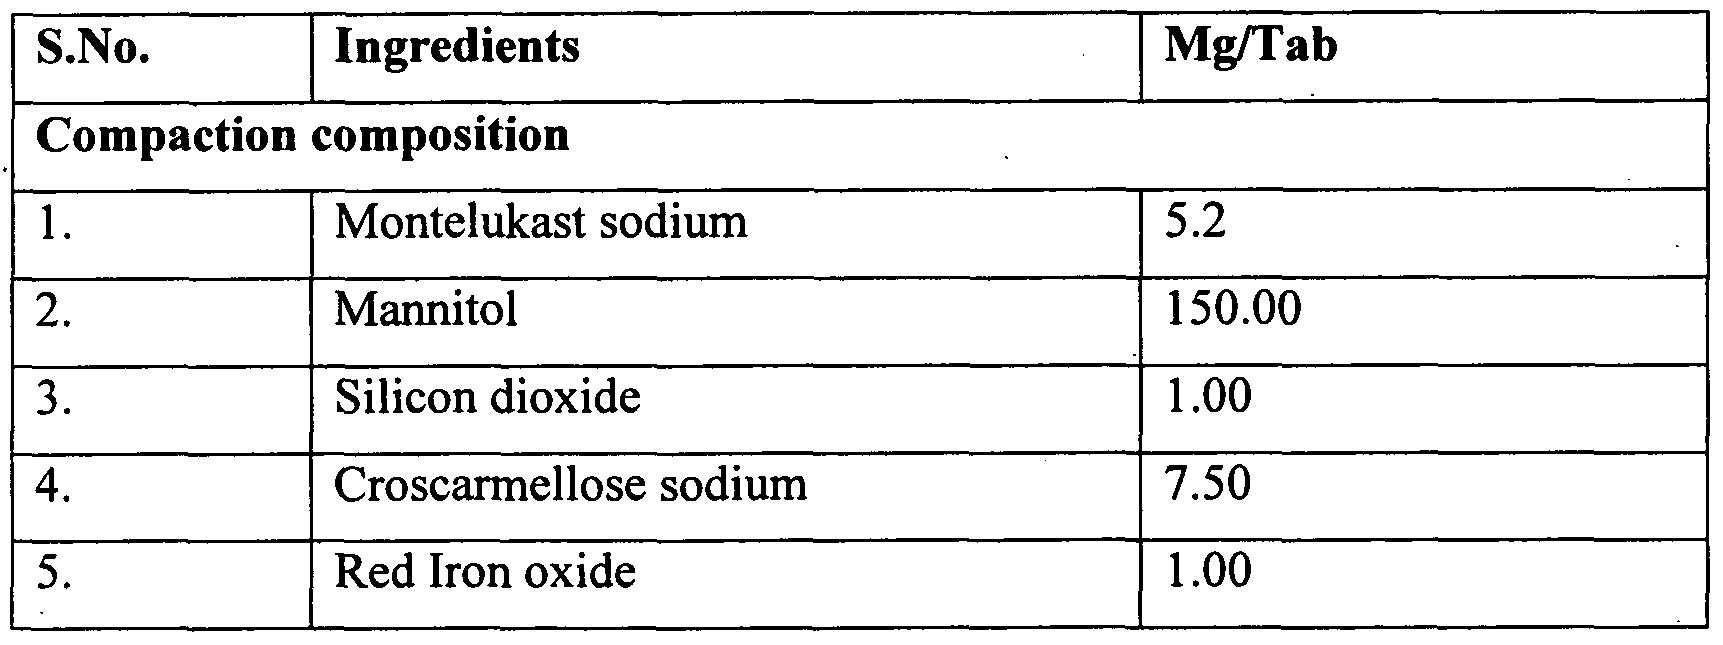 Generic singulair inactive ingredients.doc - Figure Imgf000023_0002